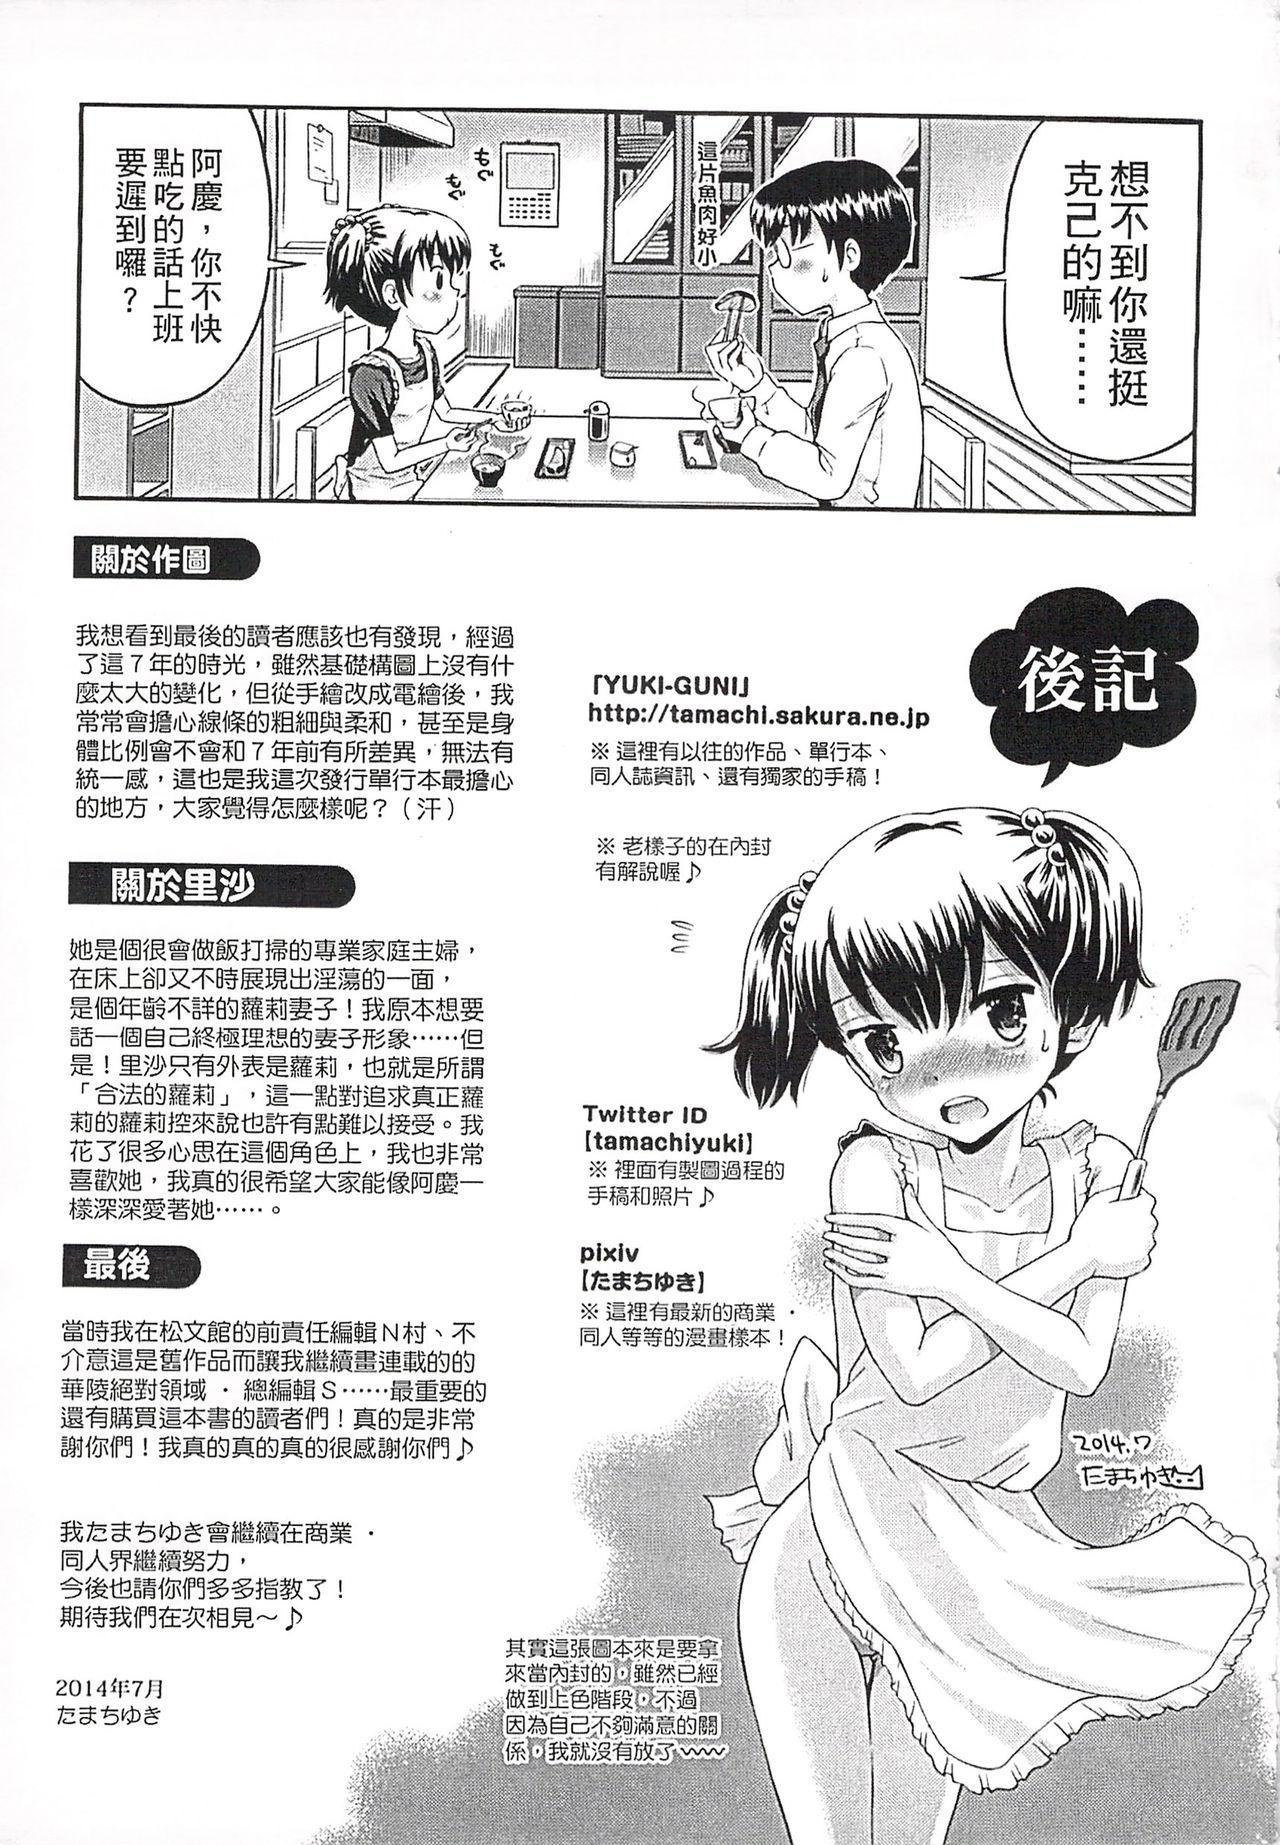 Kore demo Otona Desu Kedo!? Mrs.LOLITA Kanzenban   人家是大人啦! ~Mrs.LOLITA完全版 232